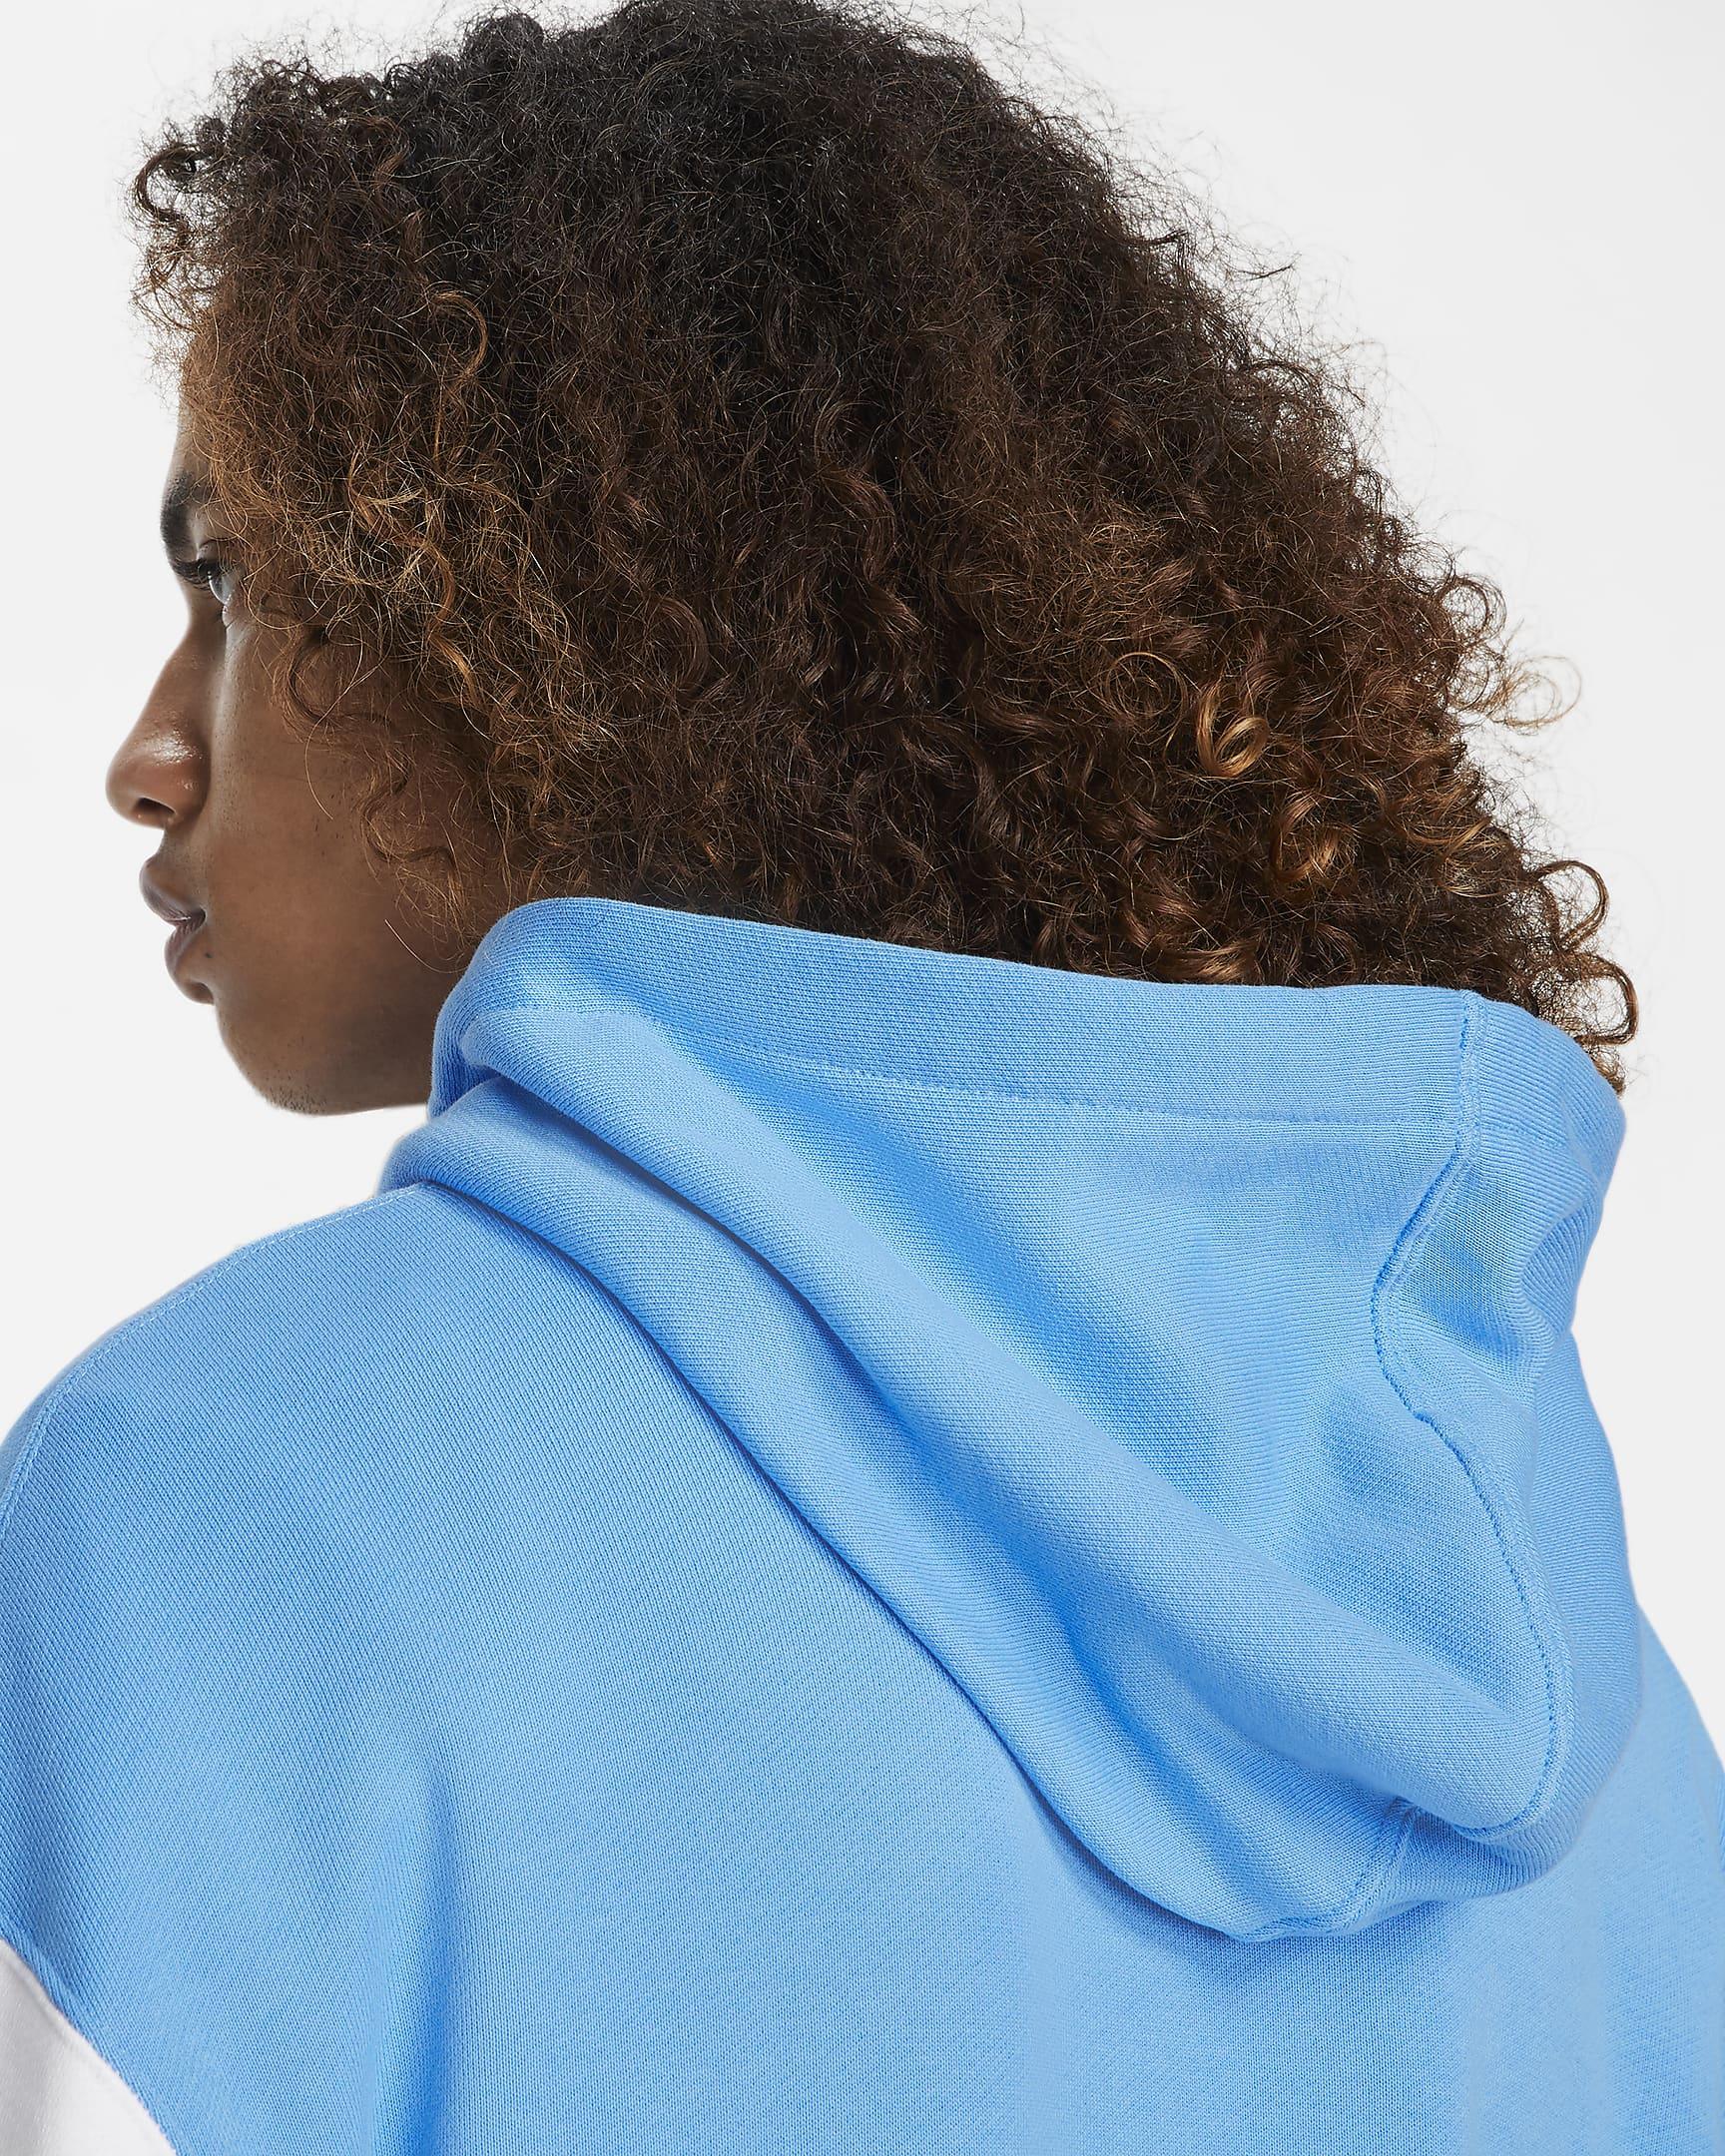 jordan-sport-dna-mens-pullover-hoodie-rMj8Rw-4